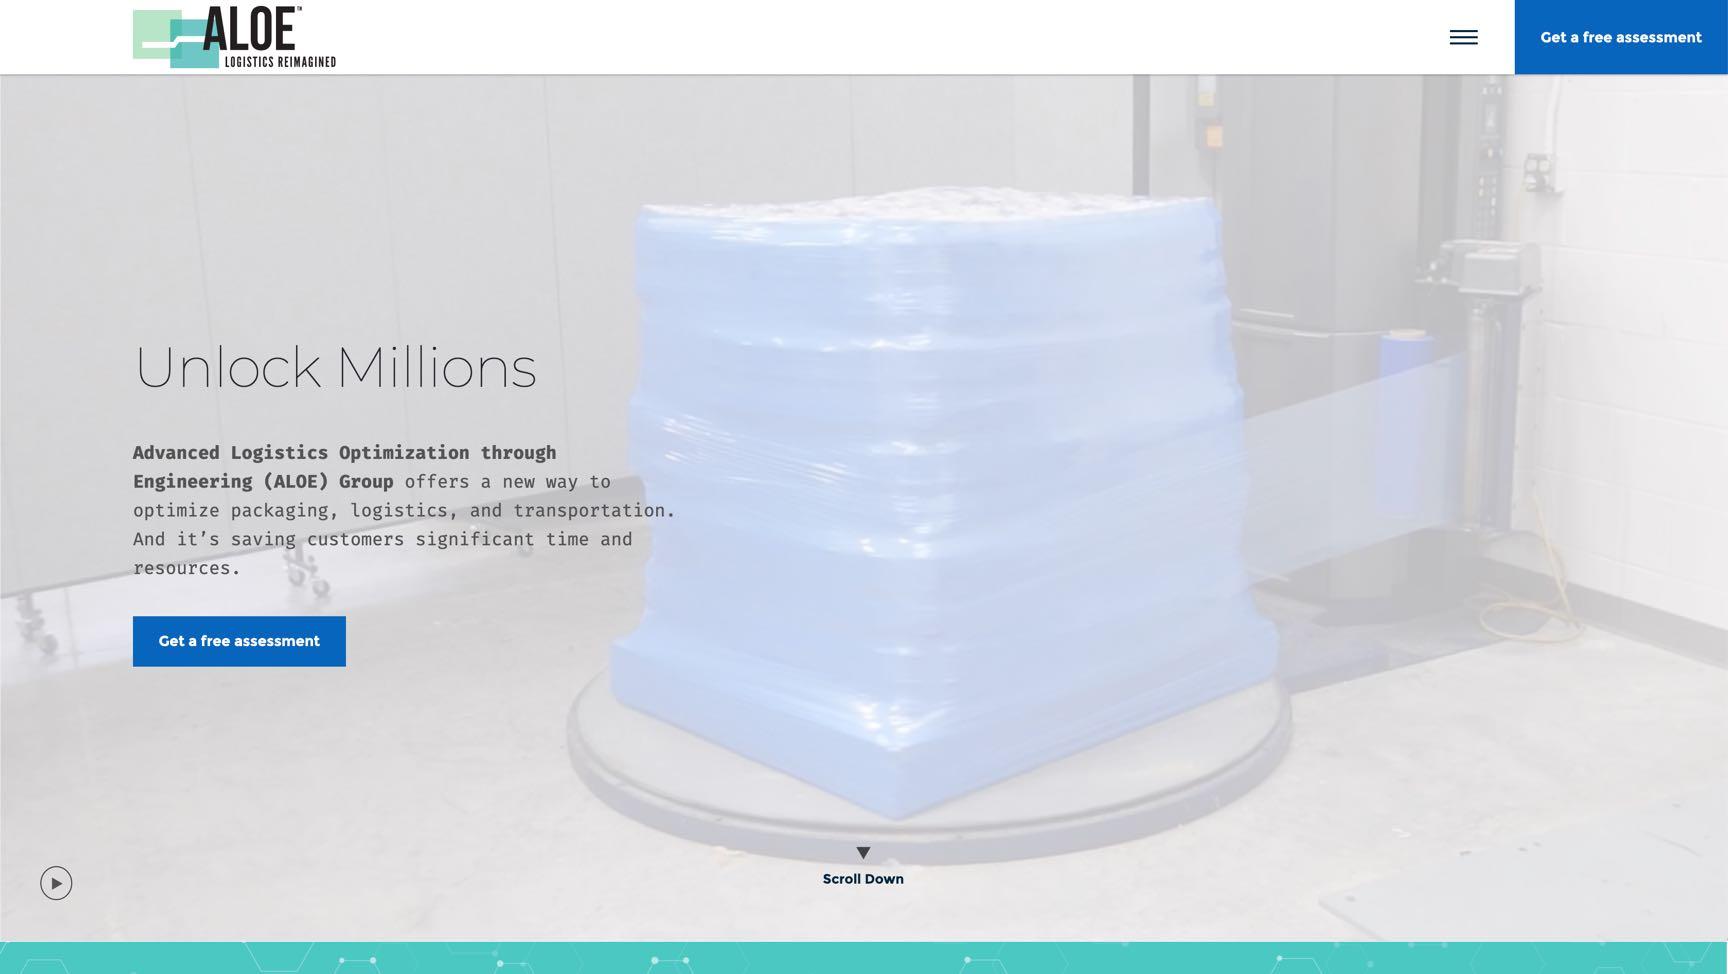 screenshot of ALOE website